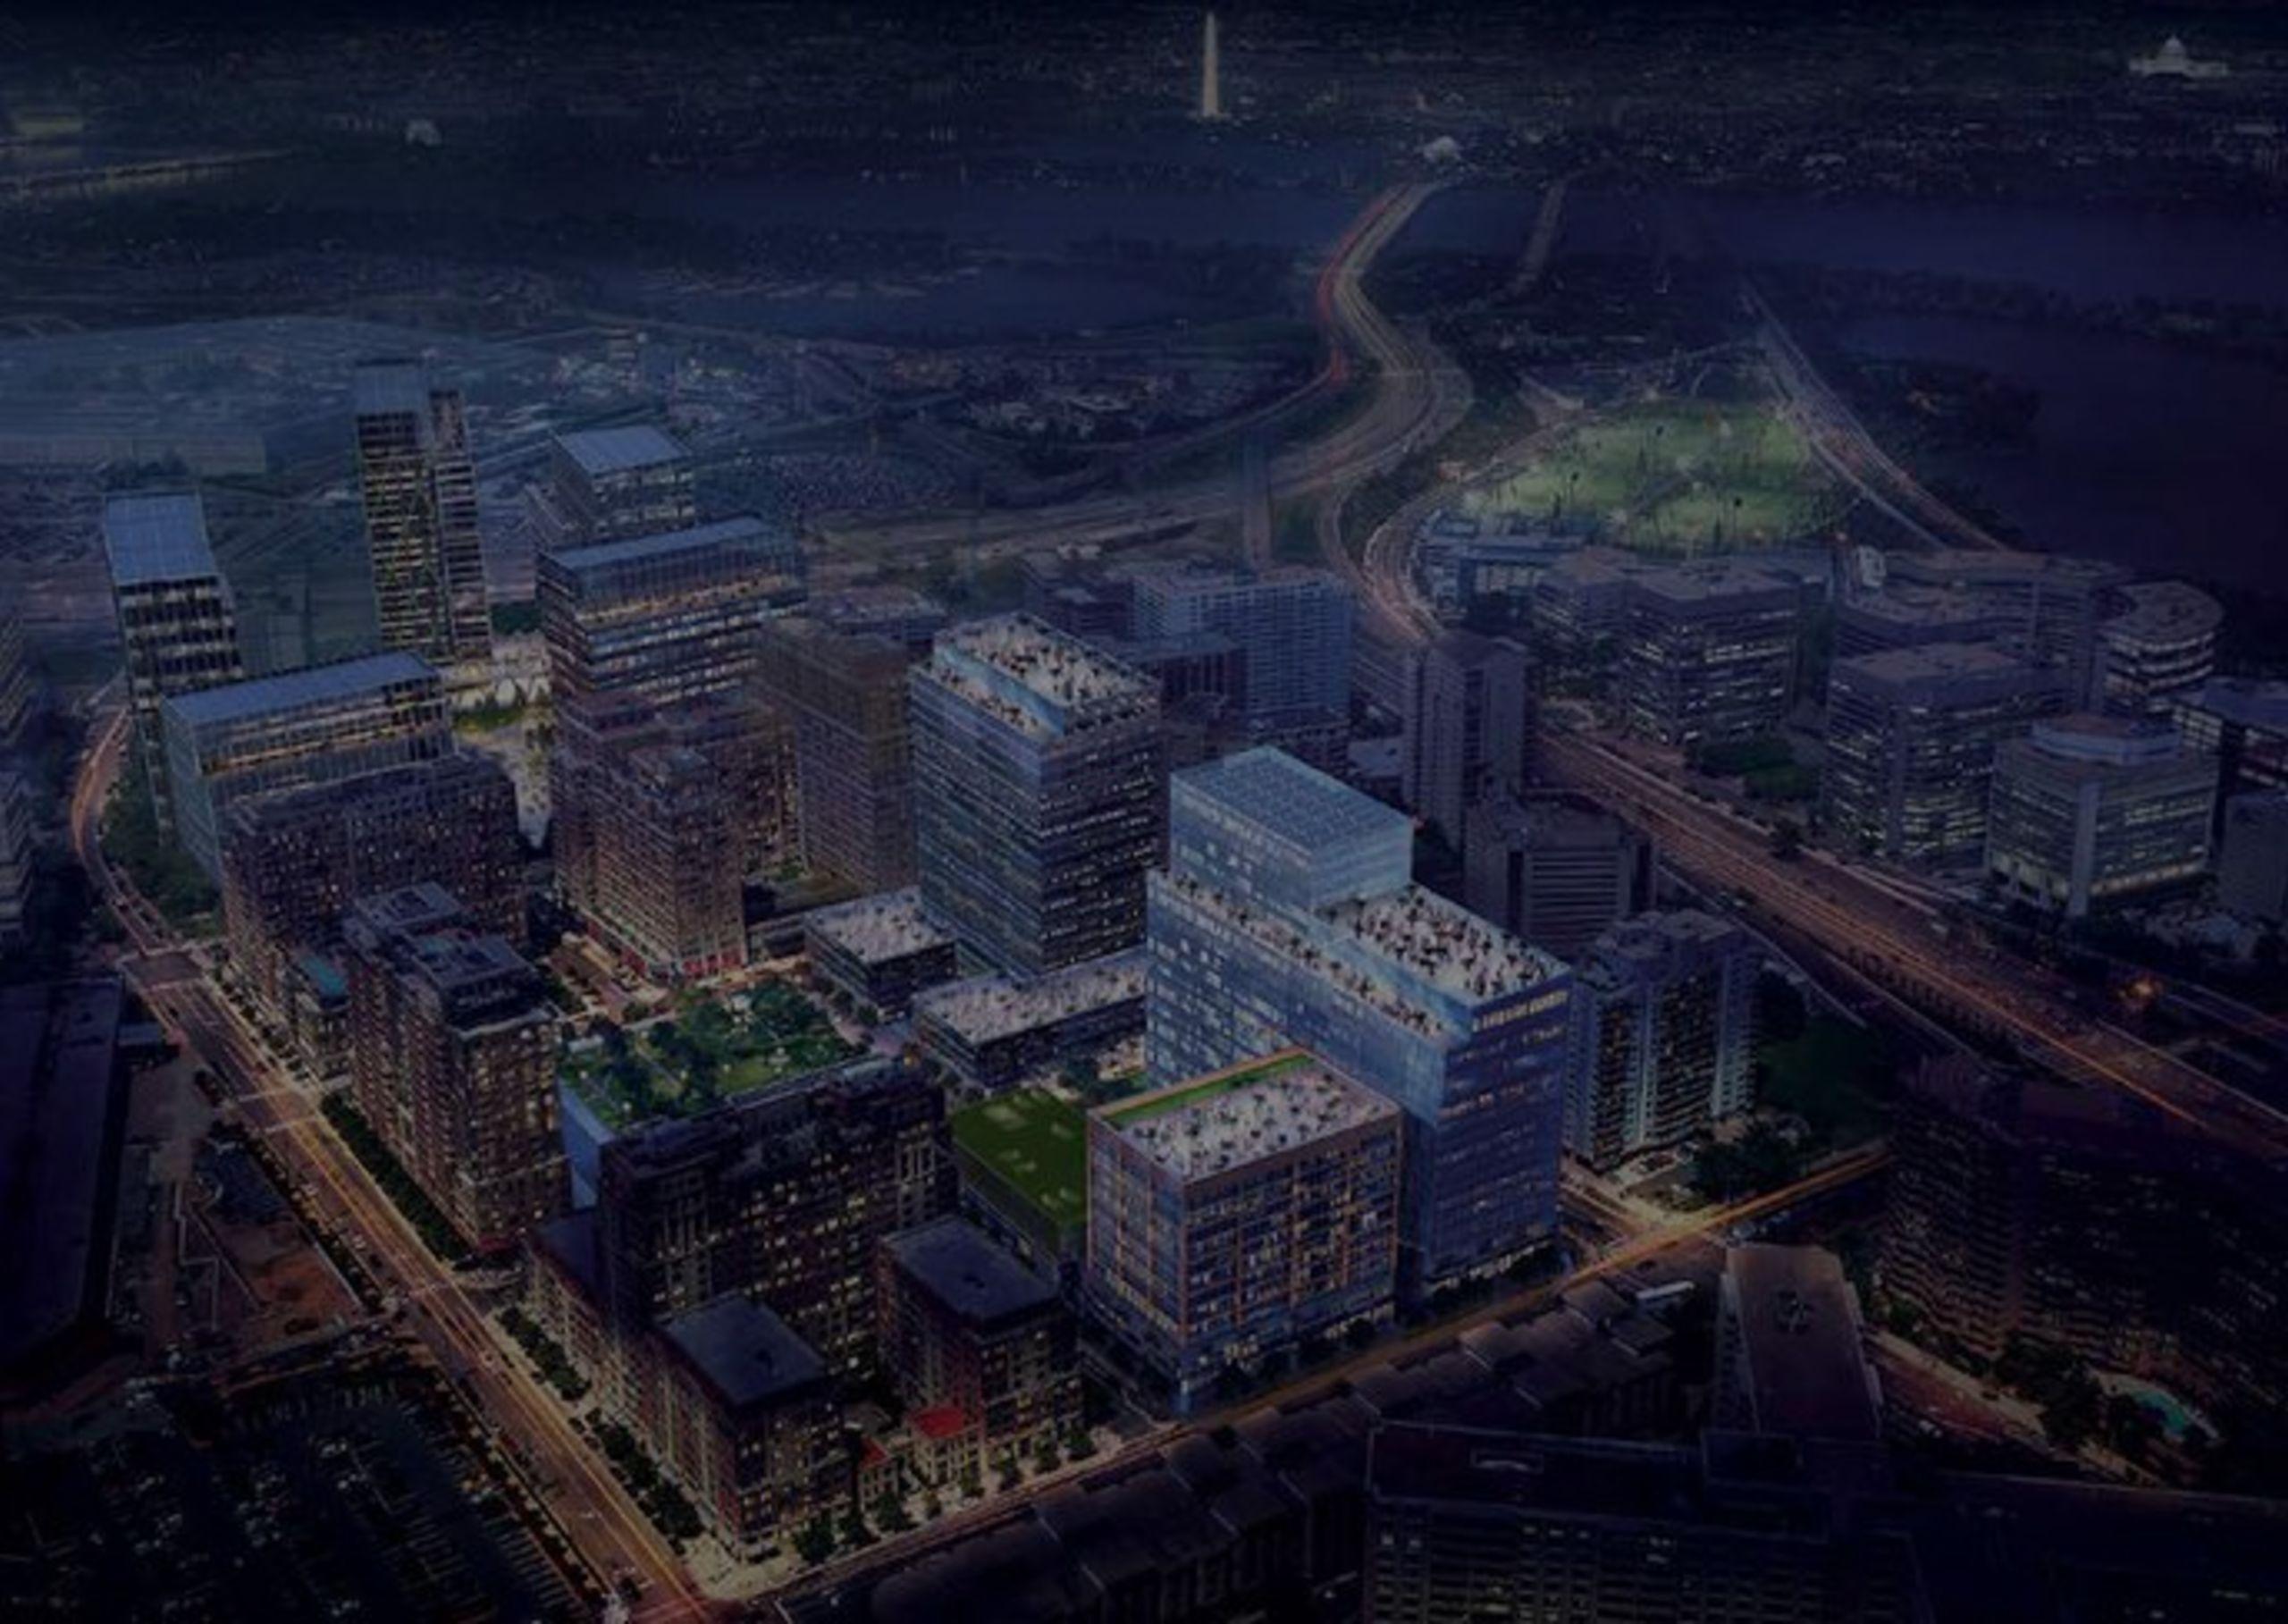 How Will Amazon Impact Housing?